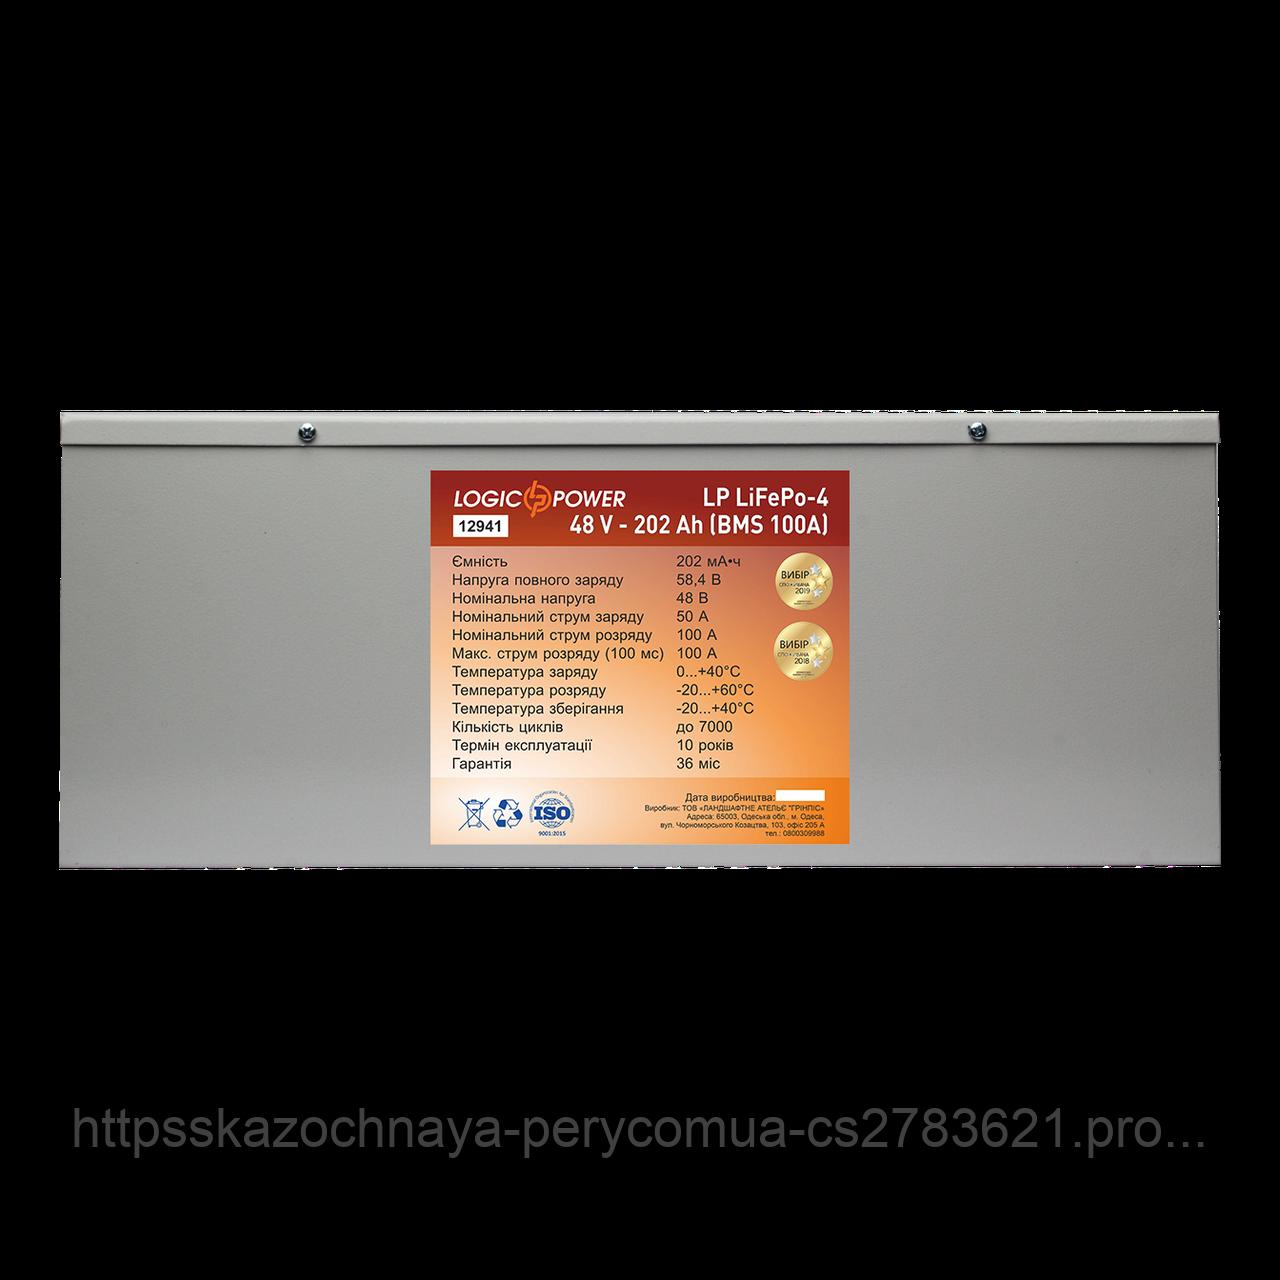 Акумулятор LP LiFePO4 48V - 202 Ah (BMS 100A) метал